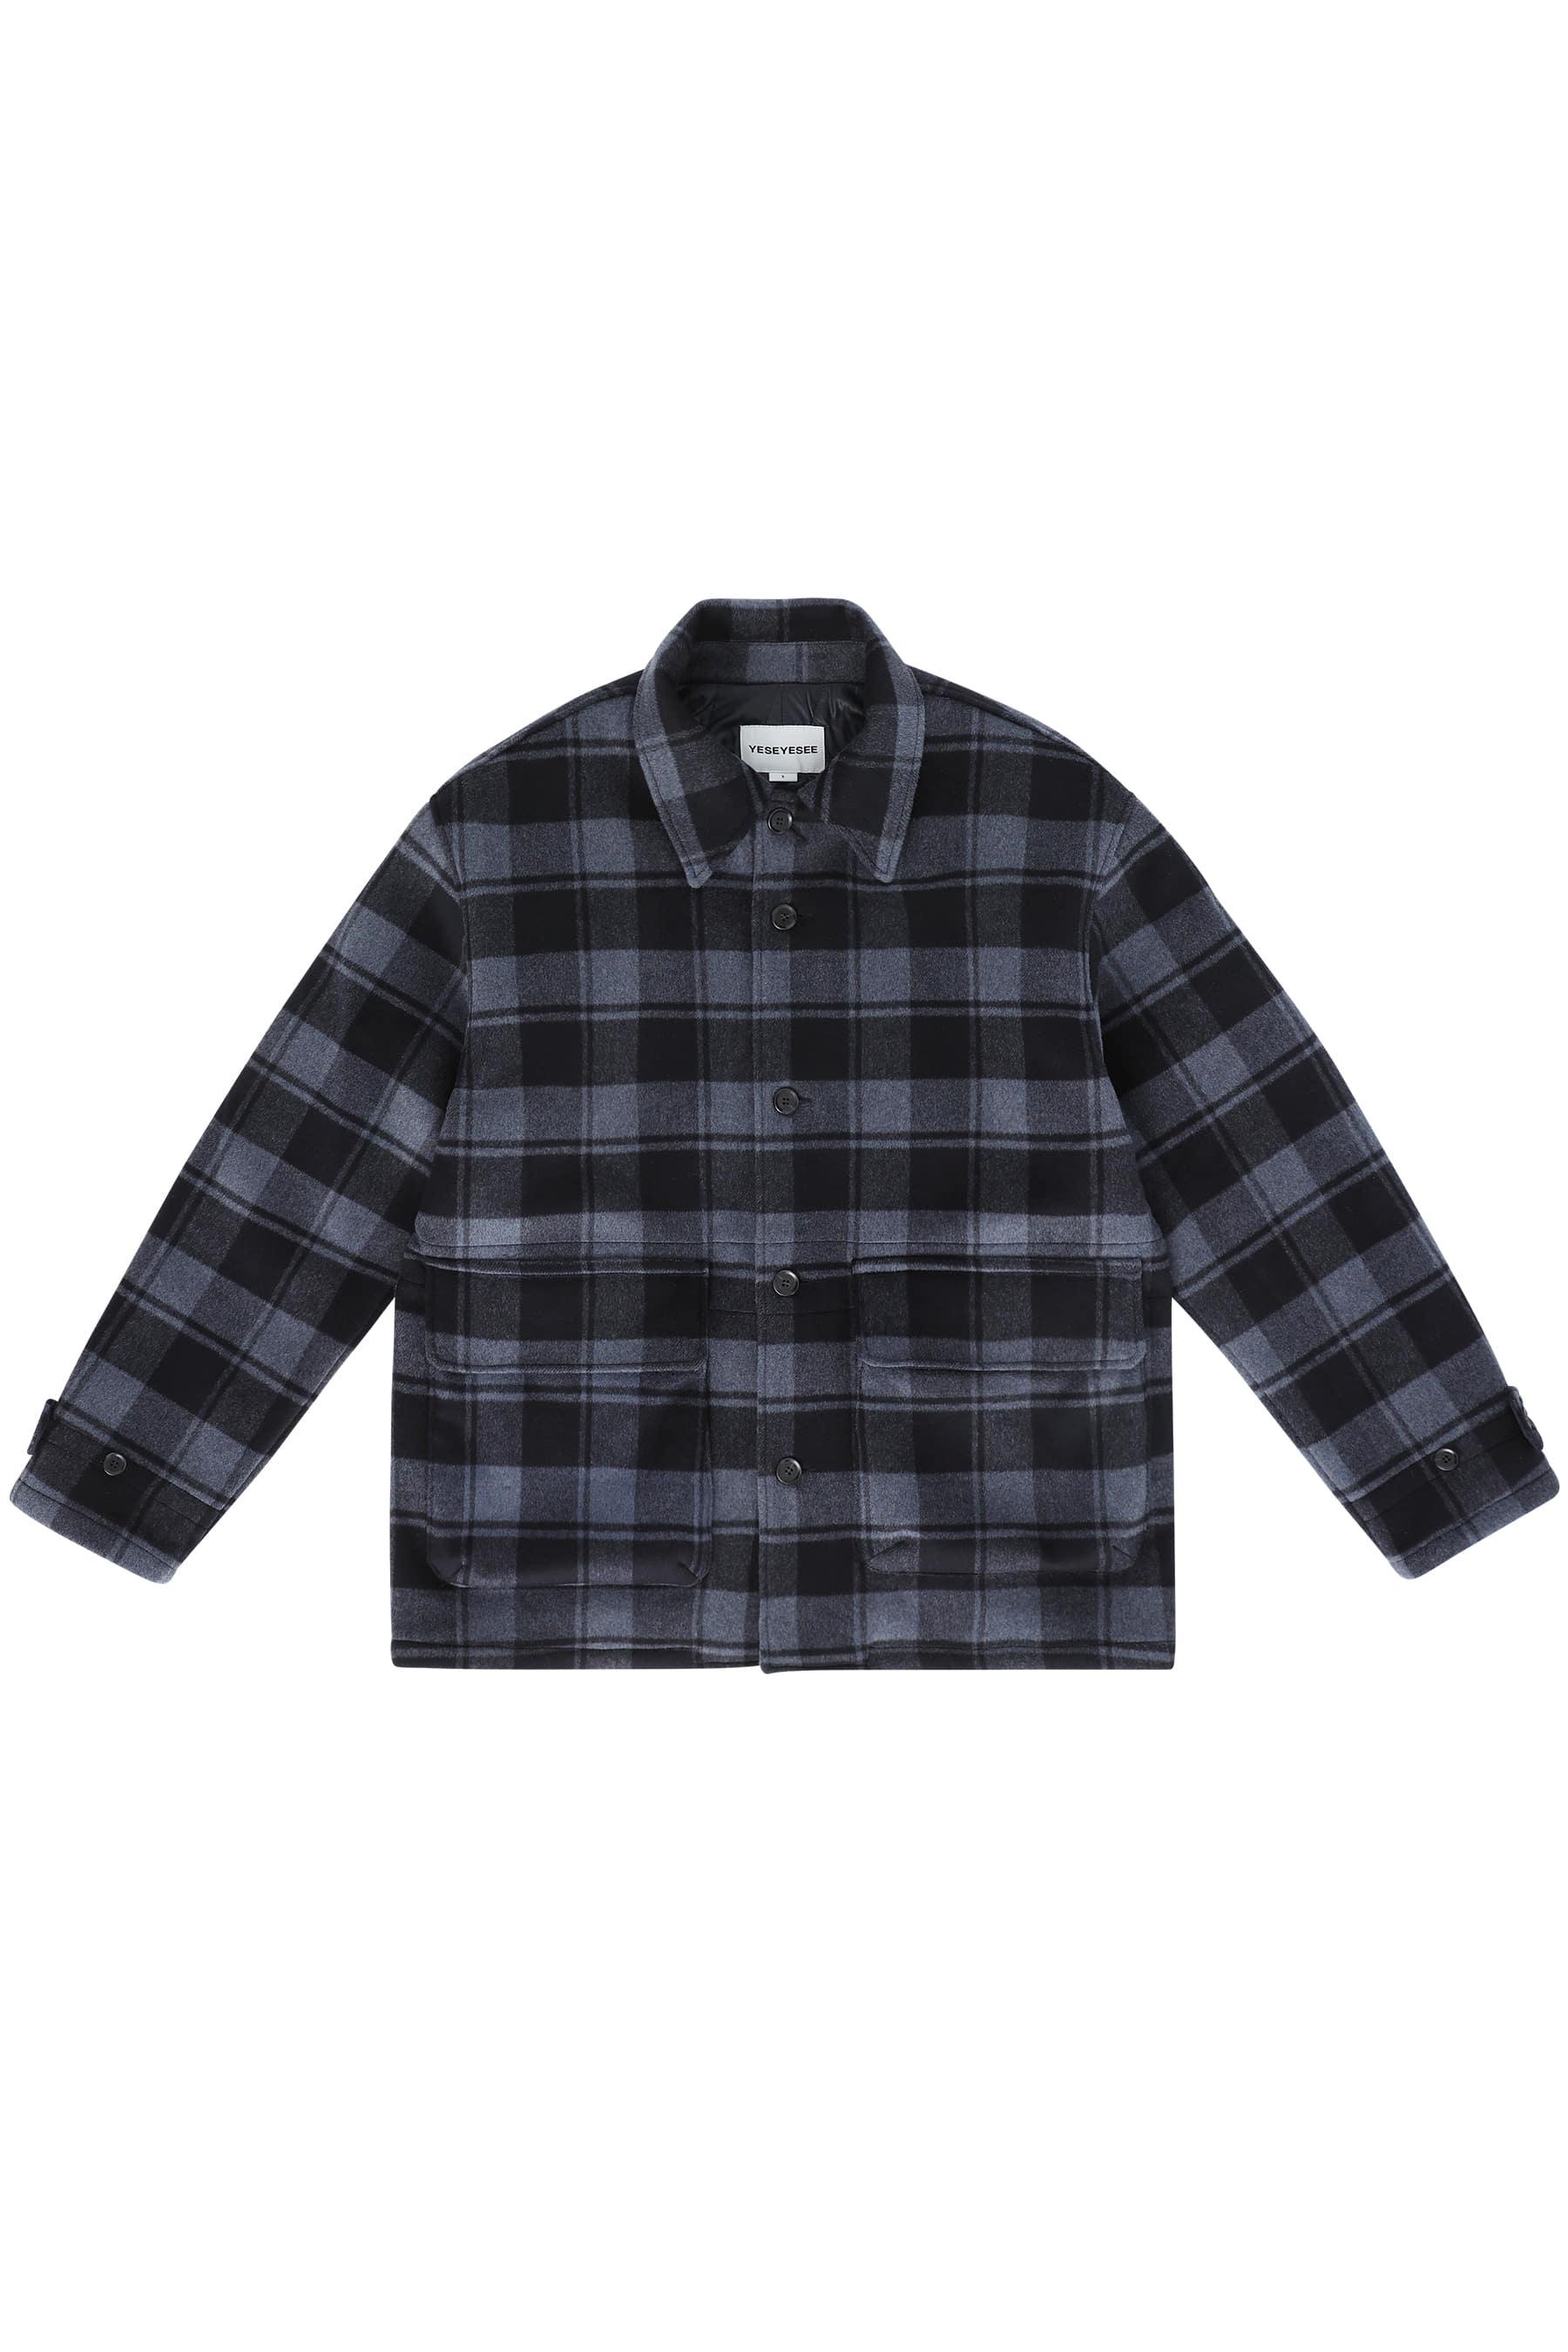 Wool Blended Check Half Coat Navy(10월 20일 예약배송)